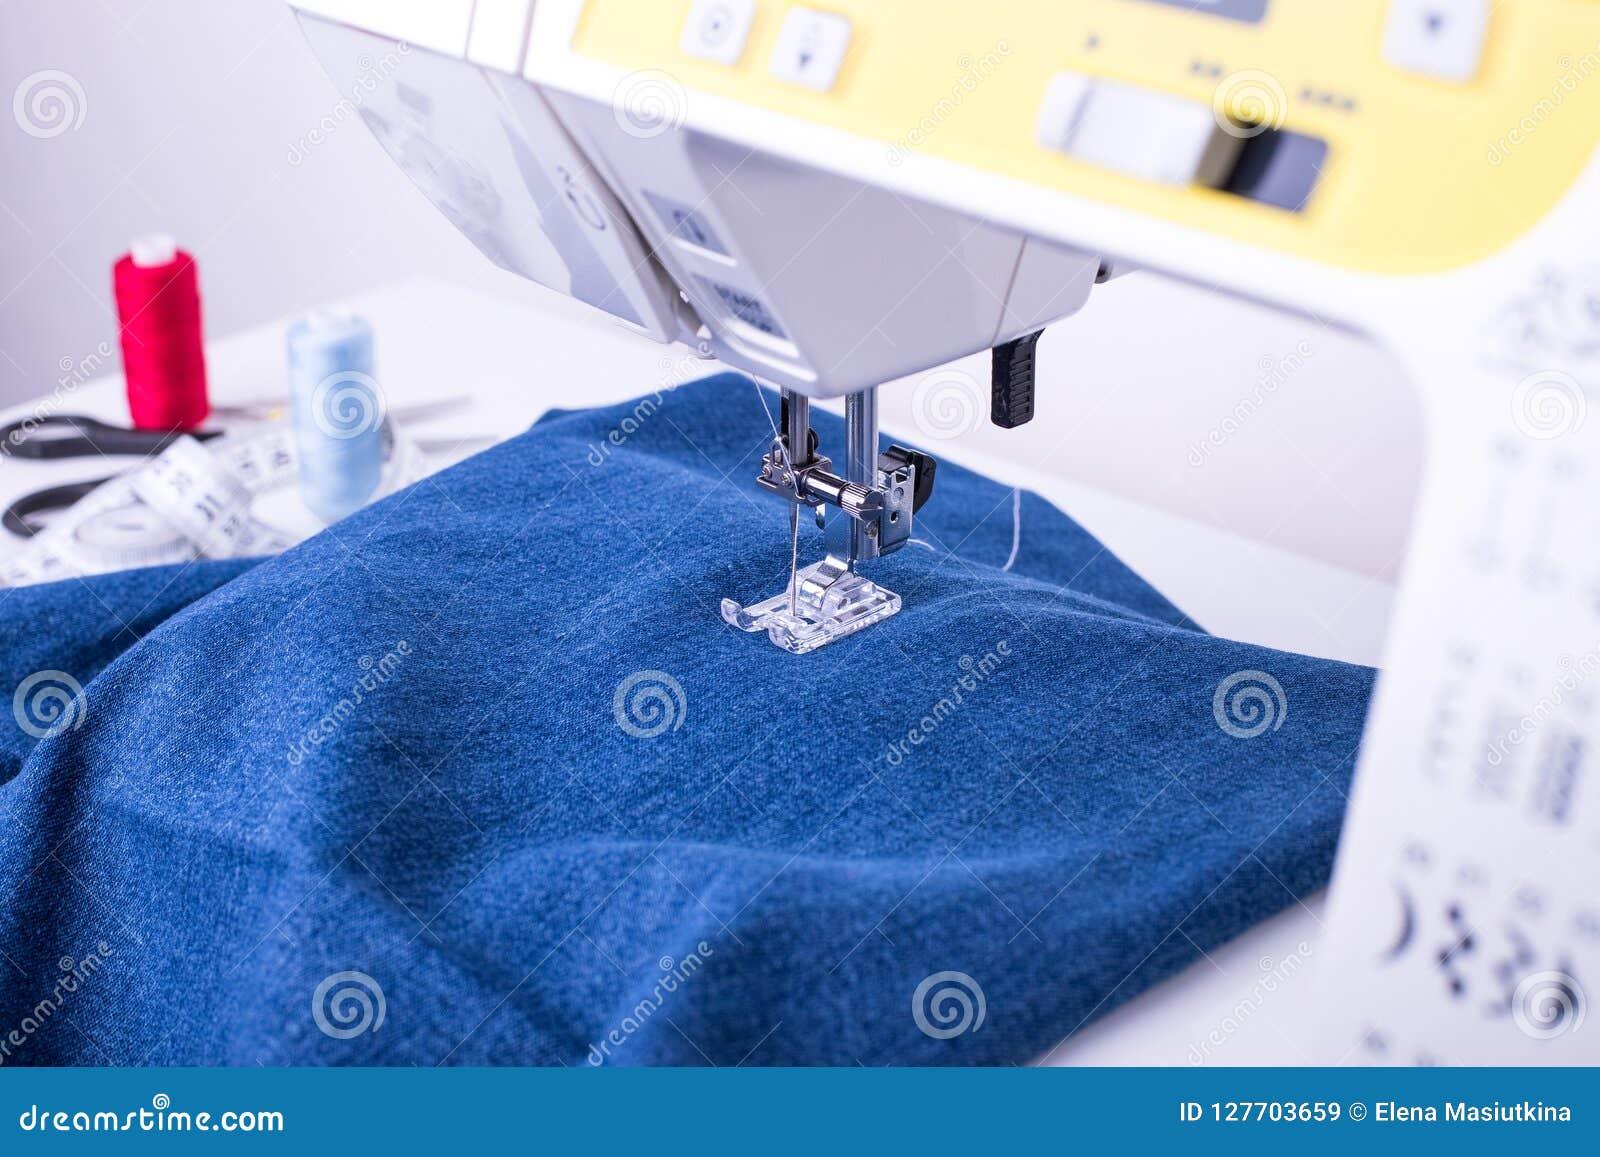 Jeanstyg på symaskinen under sydd fot